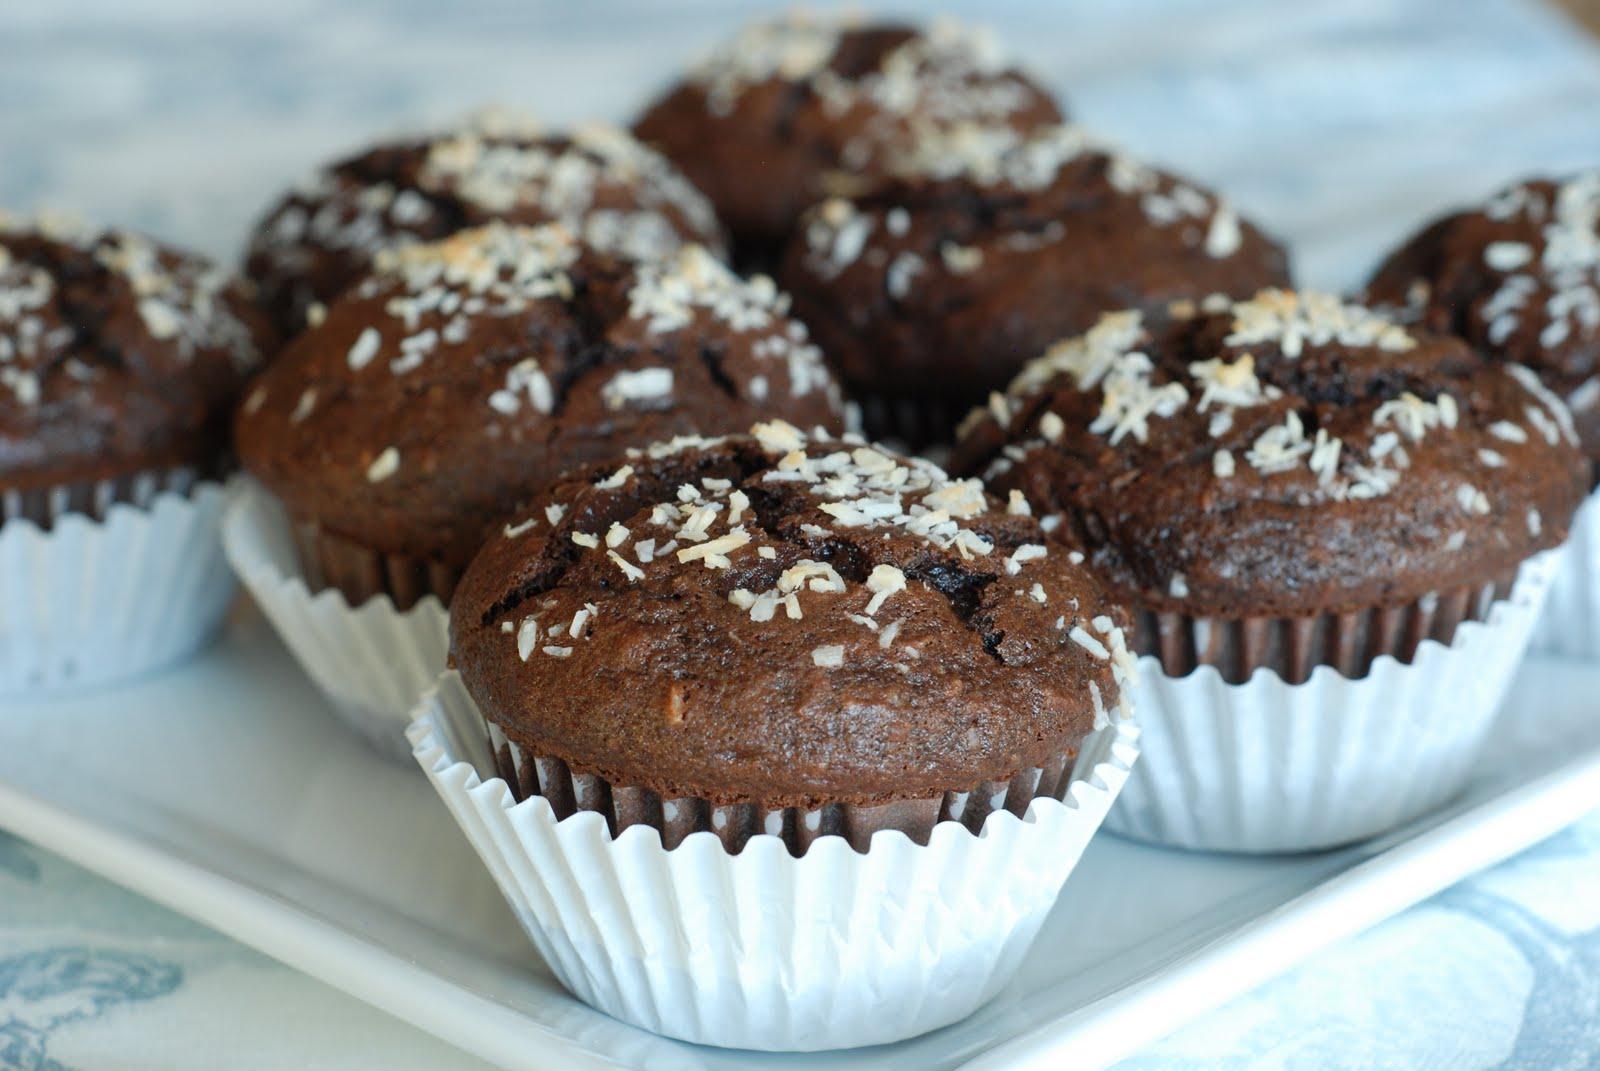 Chocolate Banana Coconut Muffins - Simply So Good